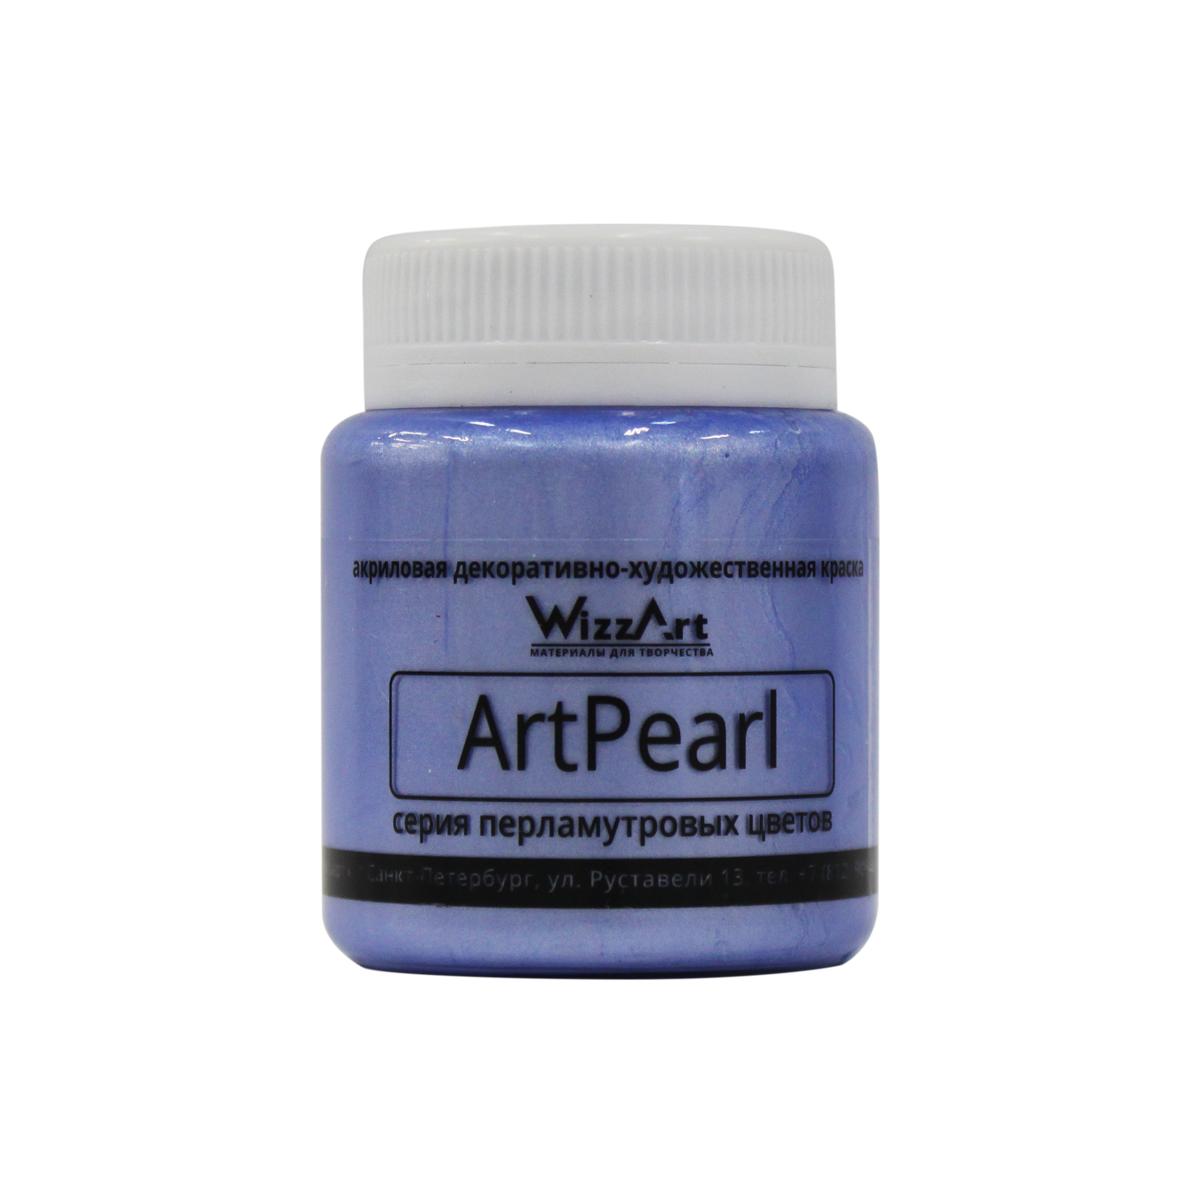 Краска акриловая Wizzart ArtPearl, цвет: ультрамарин, 80 мл501024